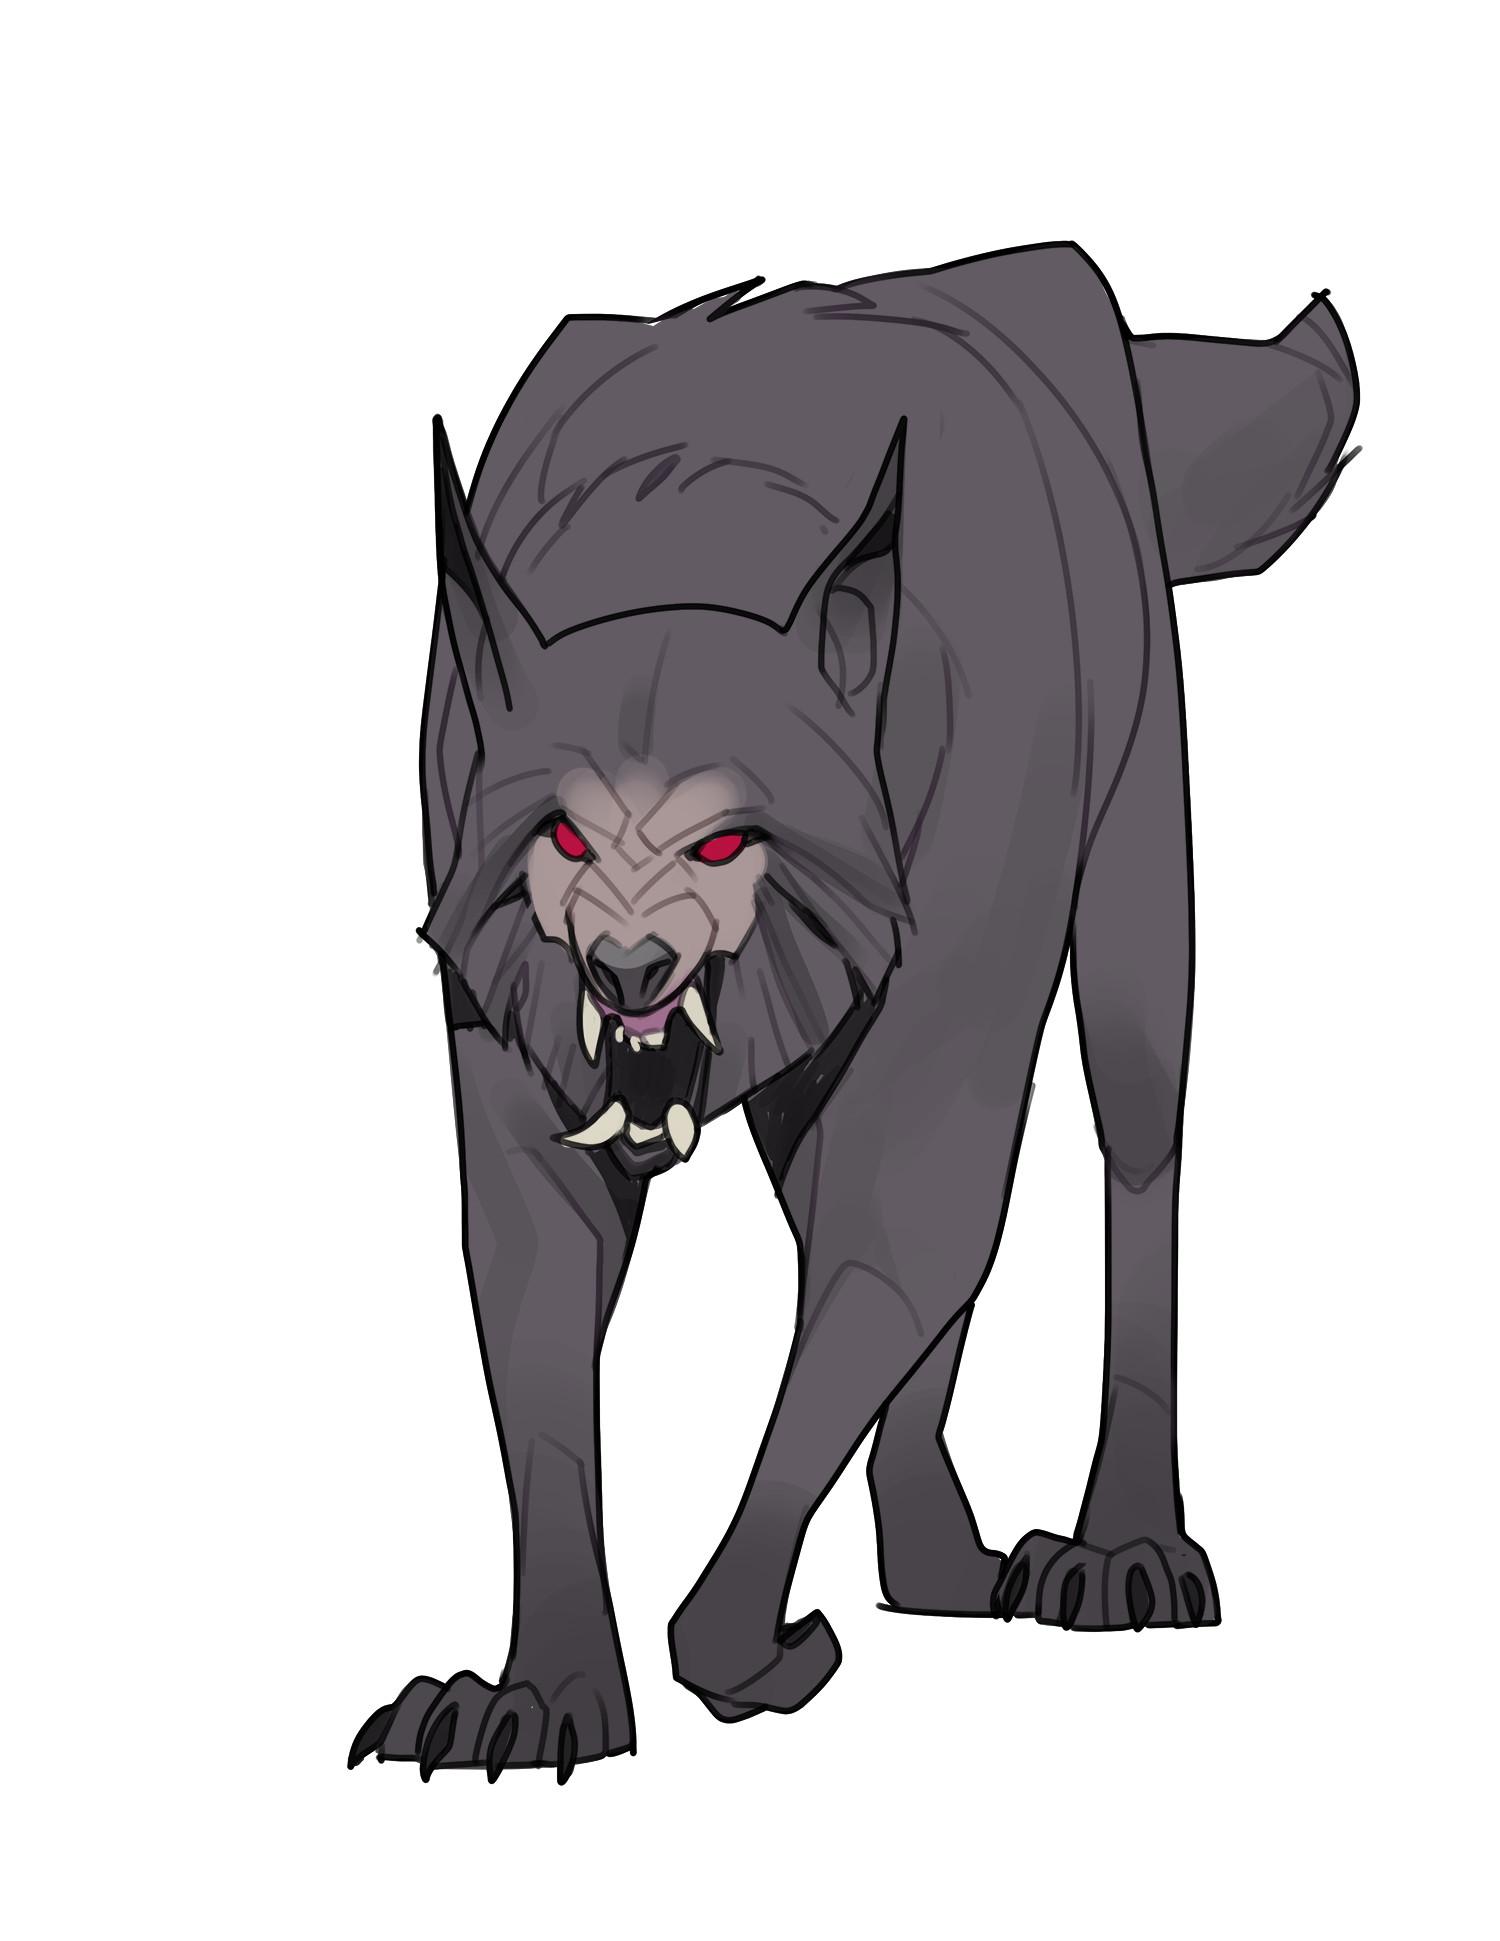 Cole marchetti x werewolf